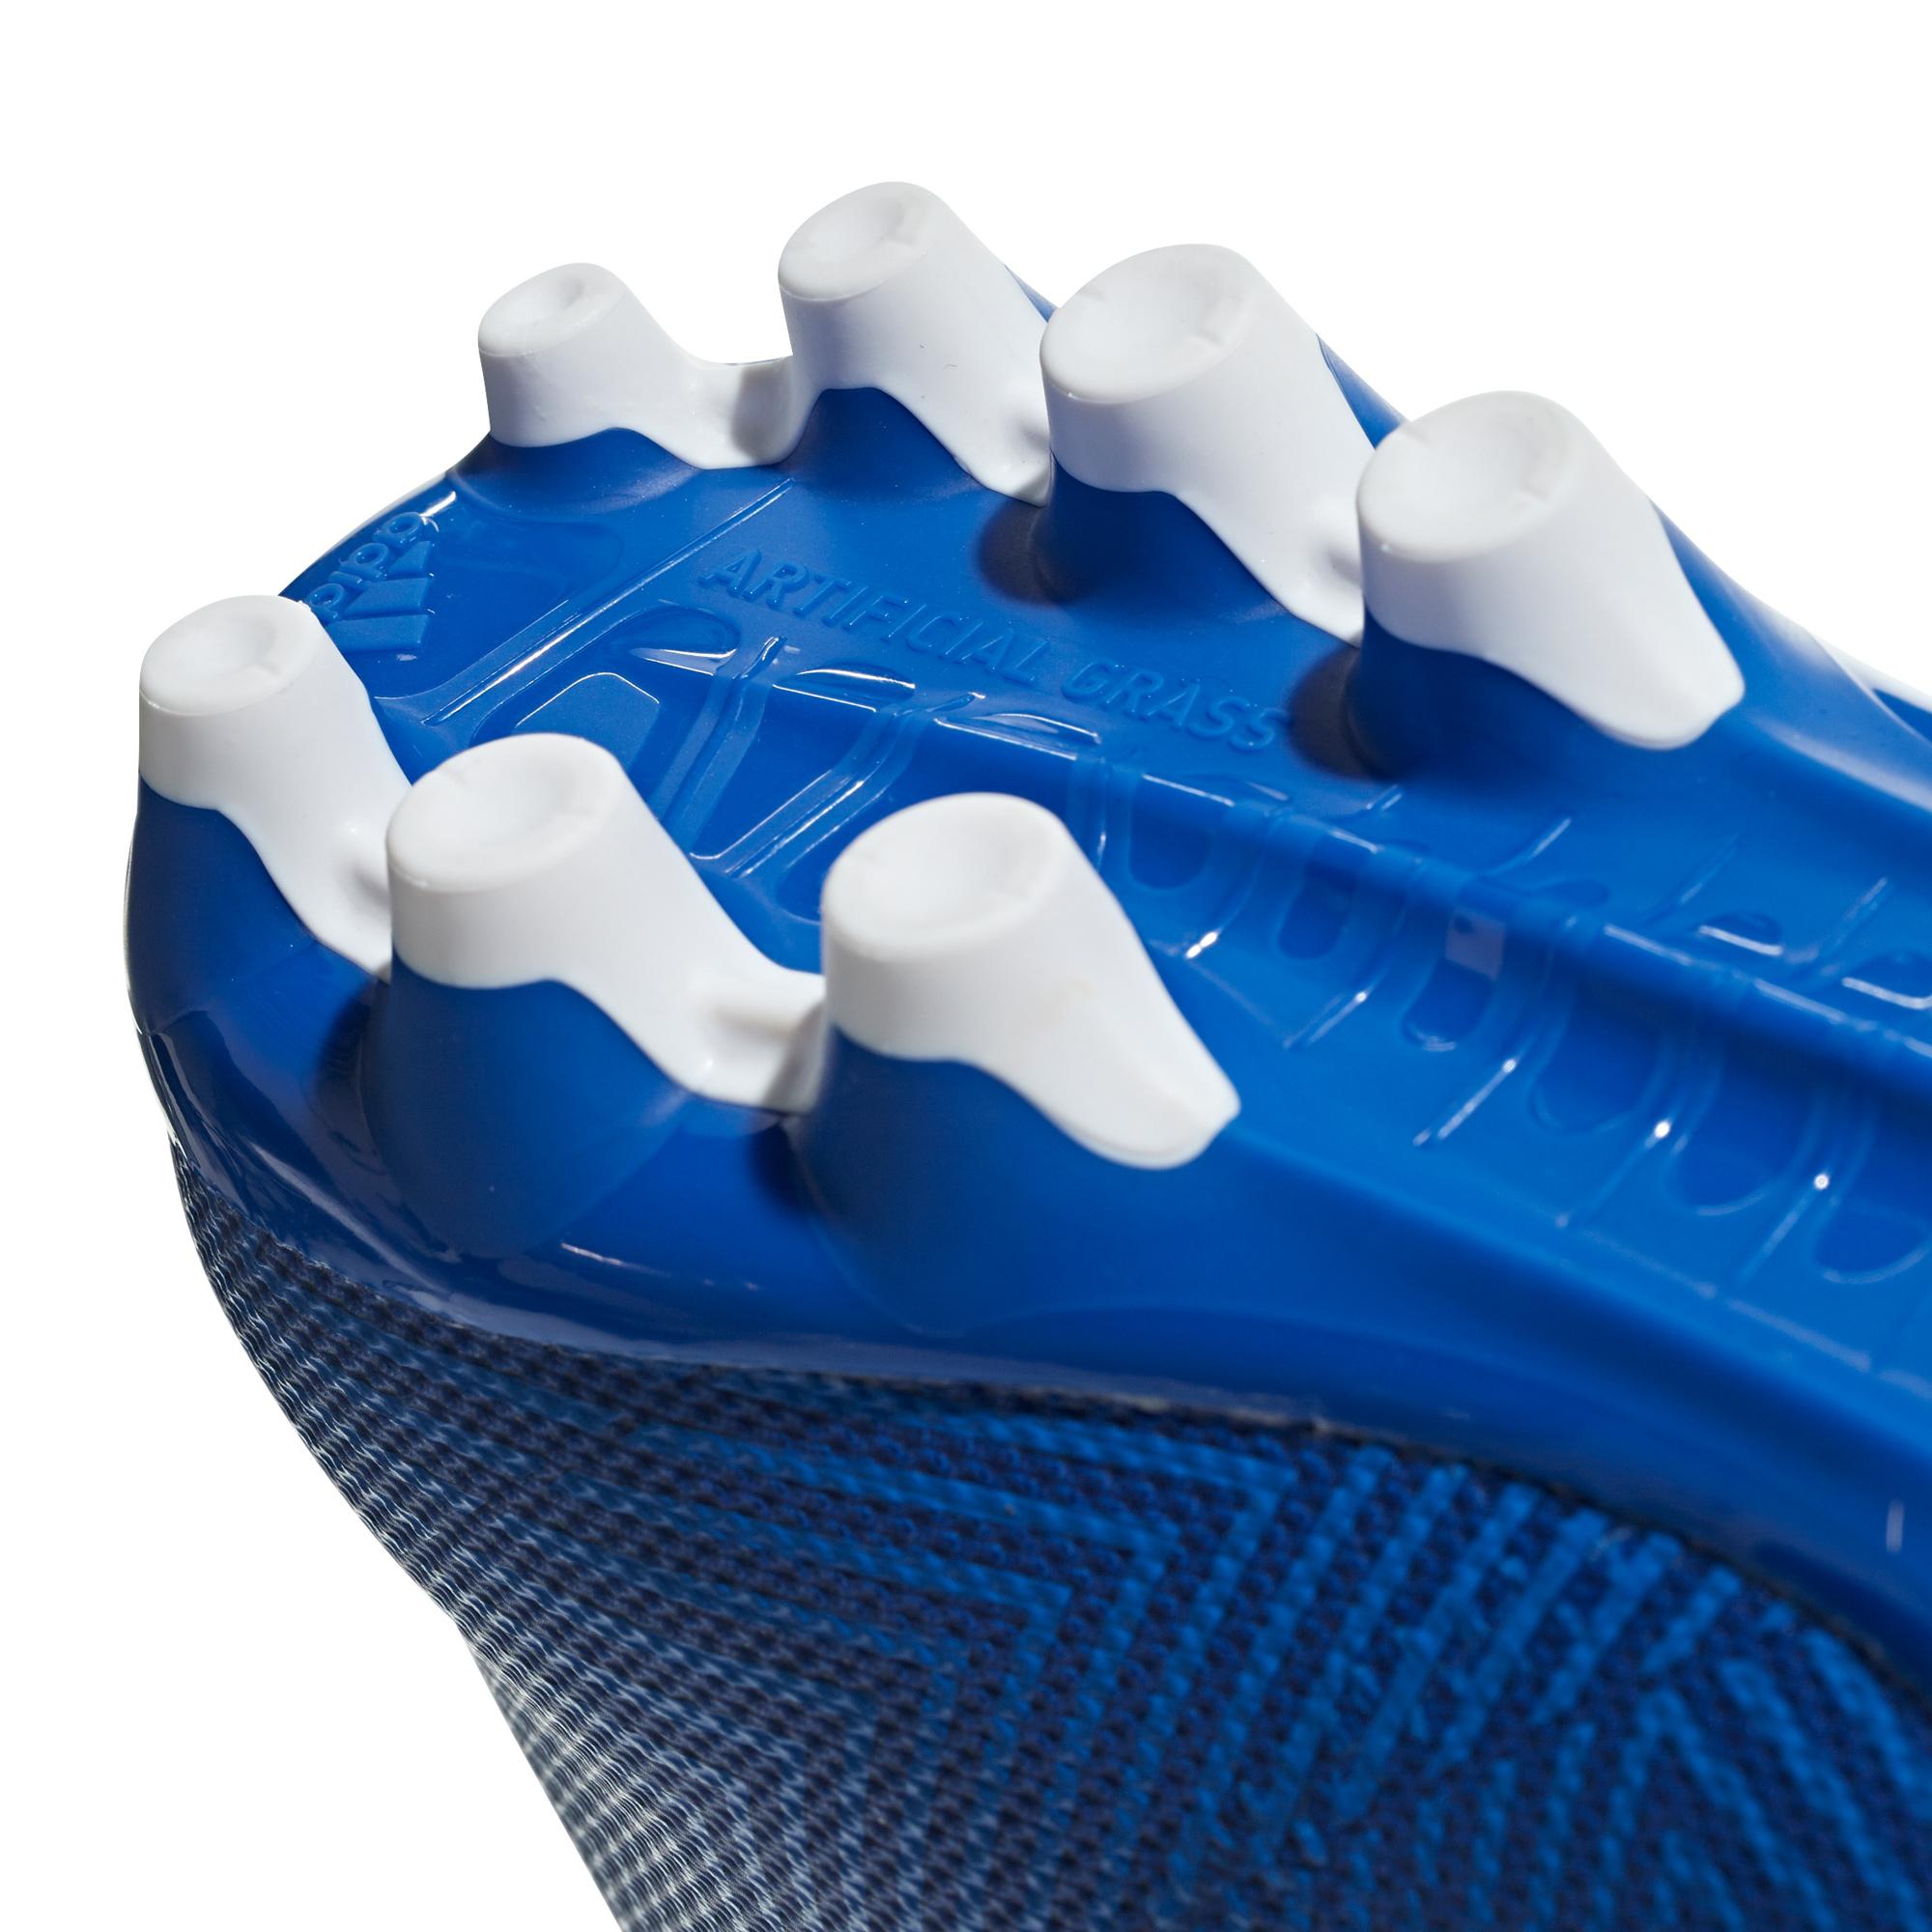 f5d489e36 adidas Nemeziz 18.3 AG - Herren Fußballschuhe Kunstrasenschuhe - BC0301 blau /weiß ...